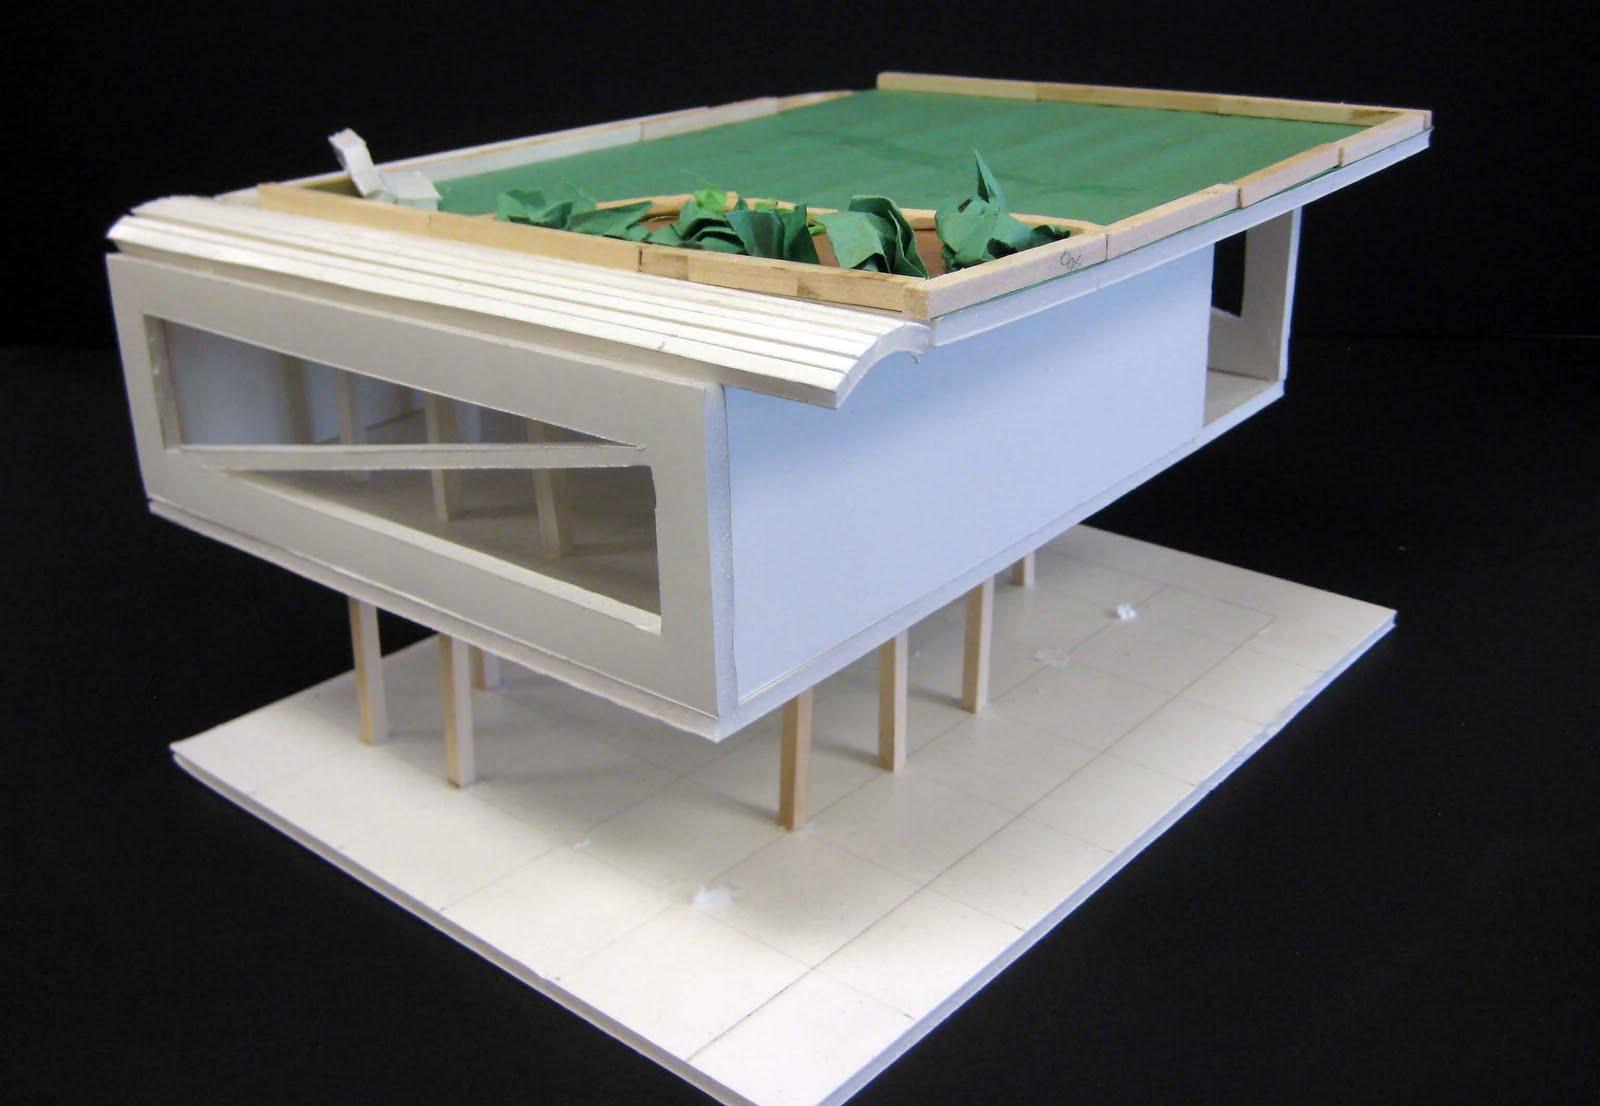 mr z student work design a building based on le corbusier 39 s 5 points of architecture. Black Bedroom Furniture Sets. Home Design Ideas